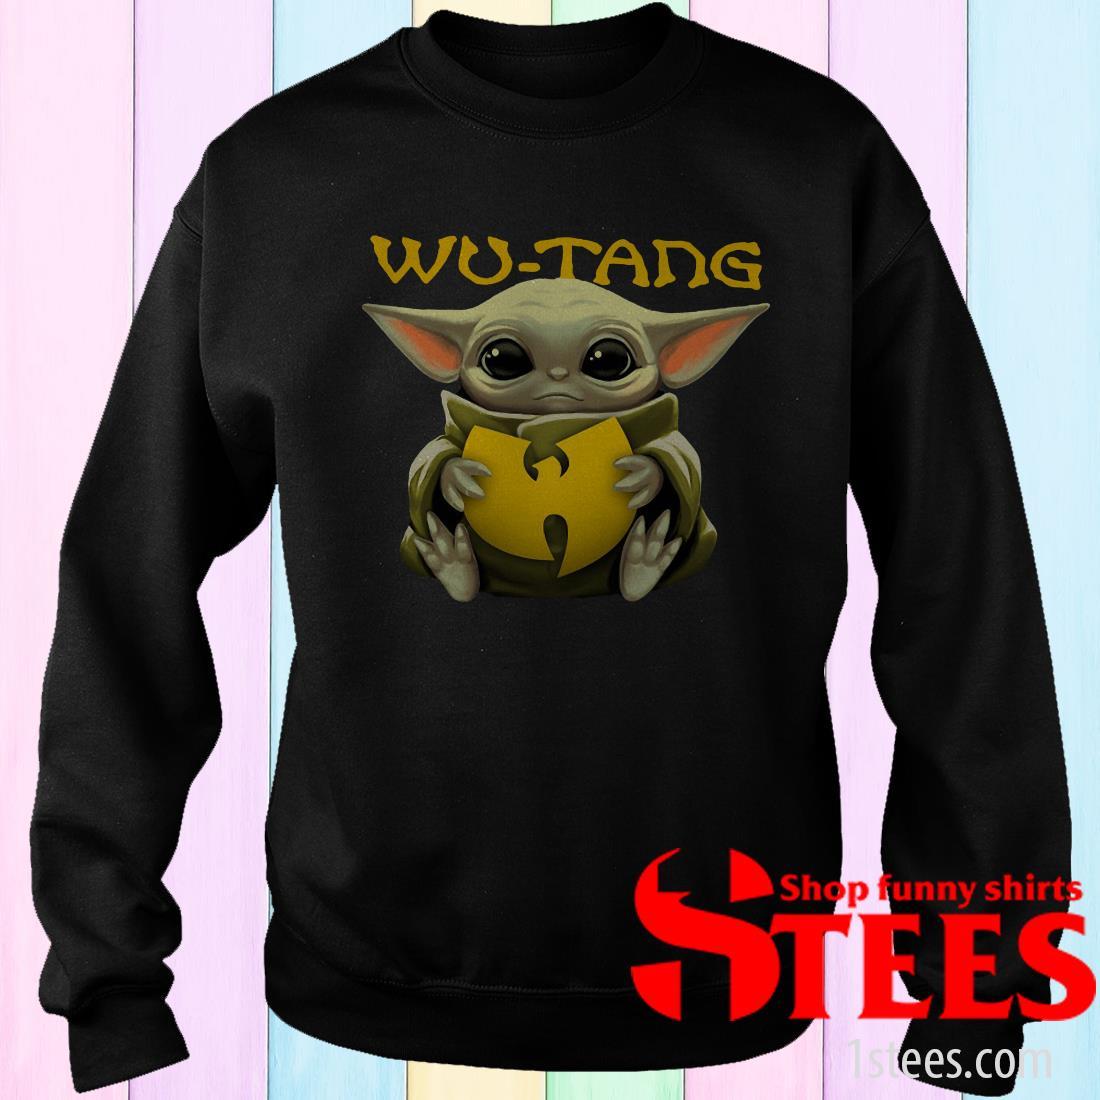 Star Wars Baby Yoda Hug Wu-Tang Shirt